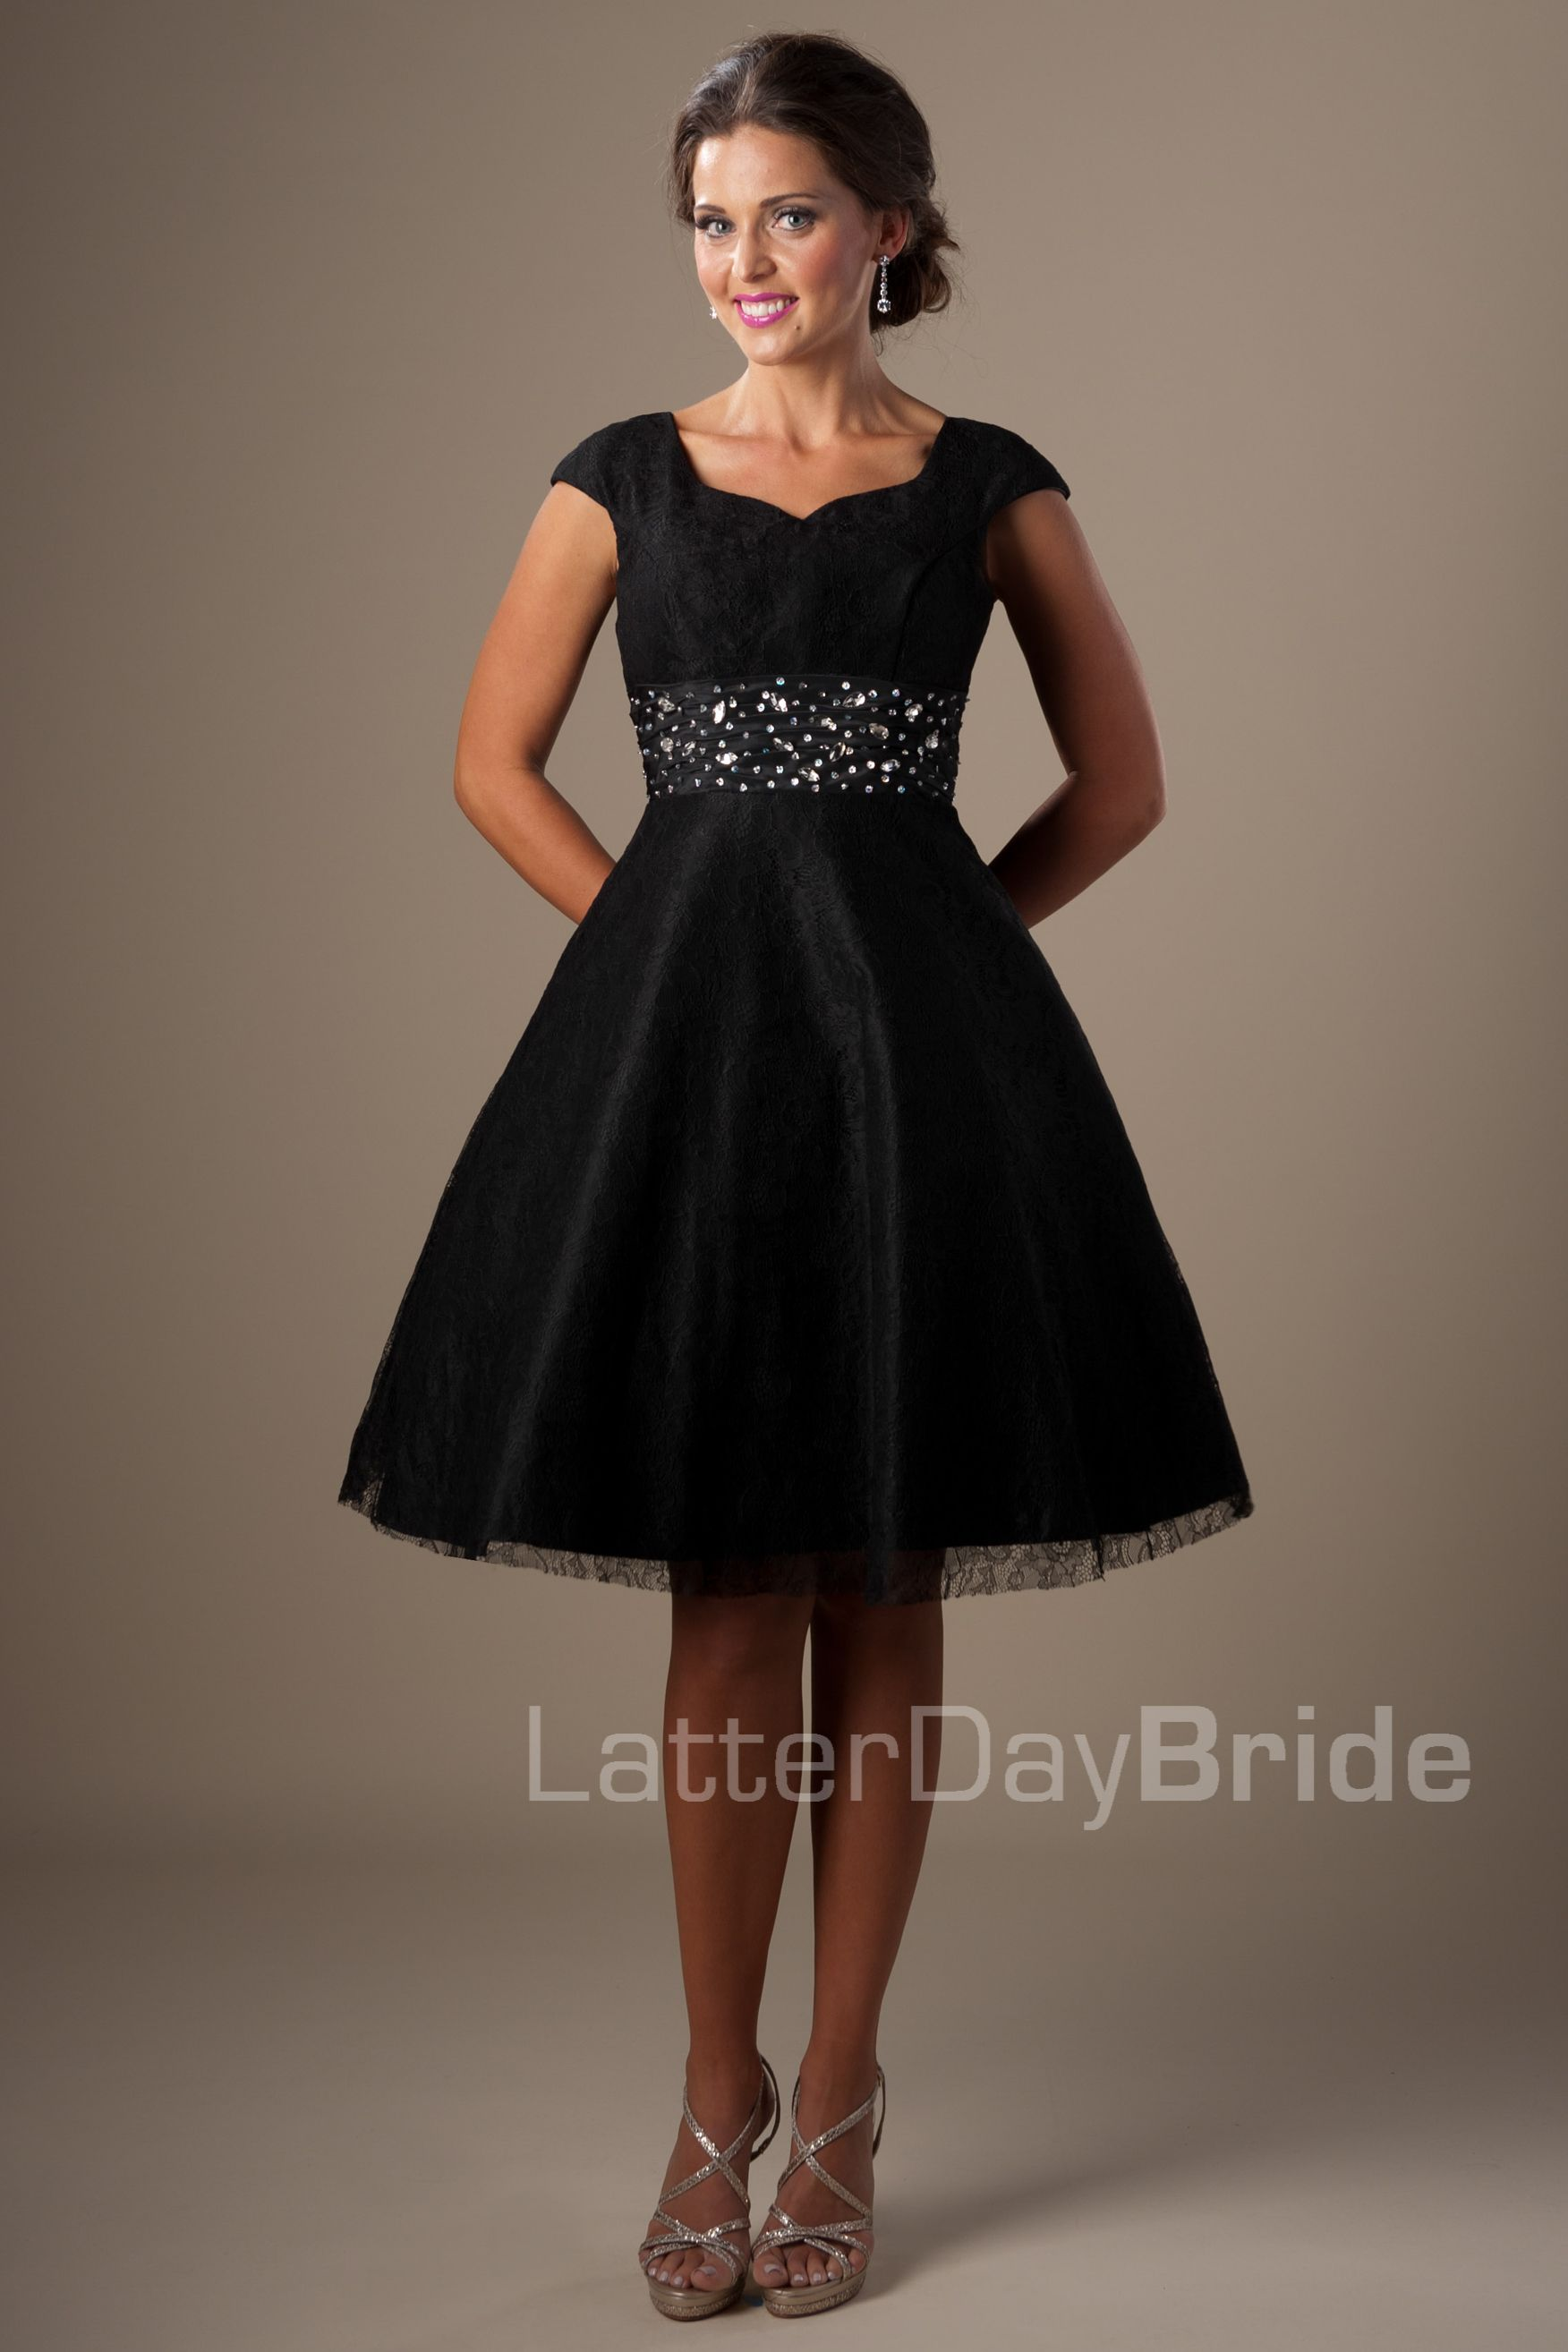 Modest Prom Dresses : Claire | Modest Prom Dresses | Pinterest ...